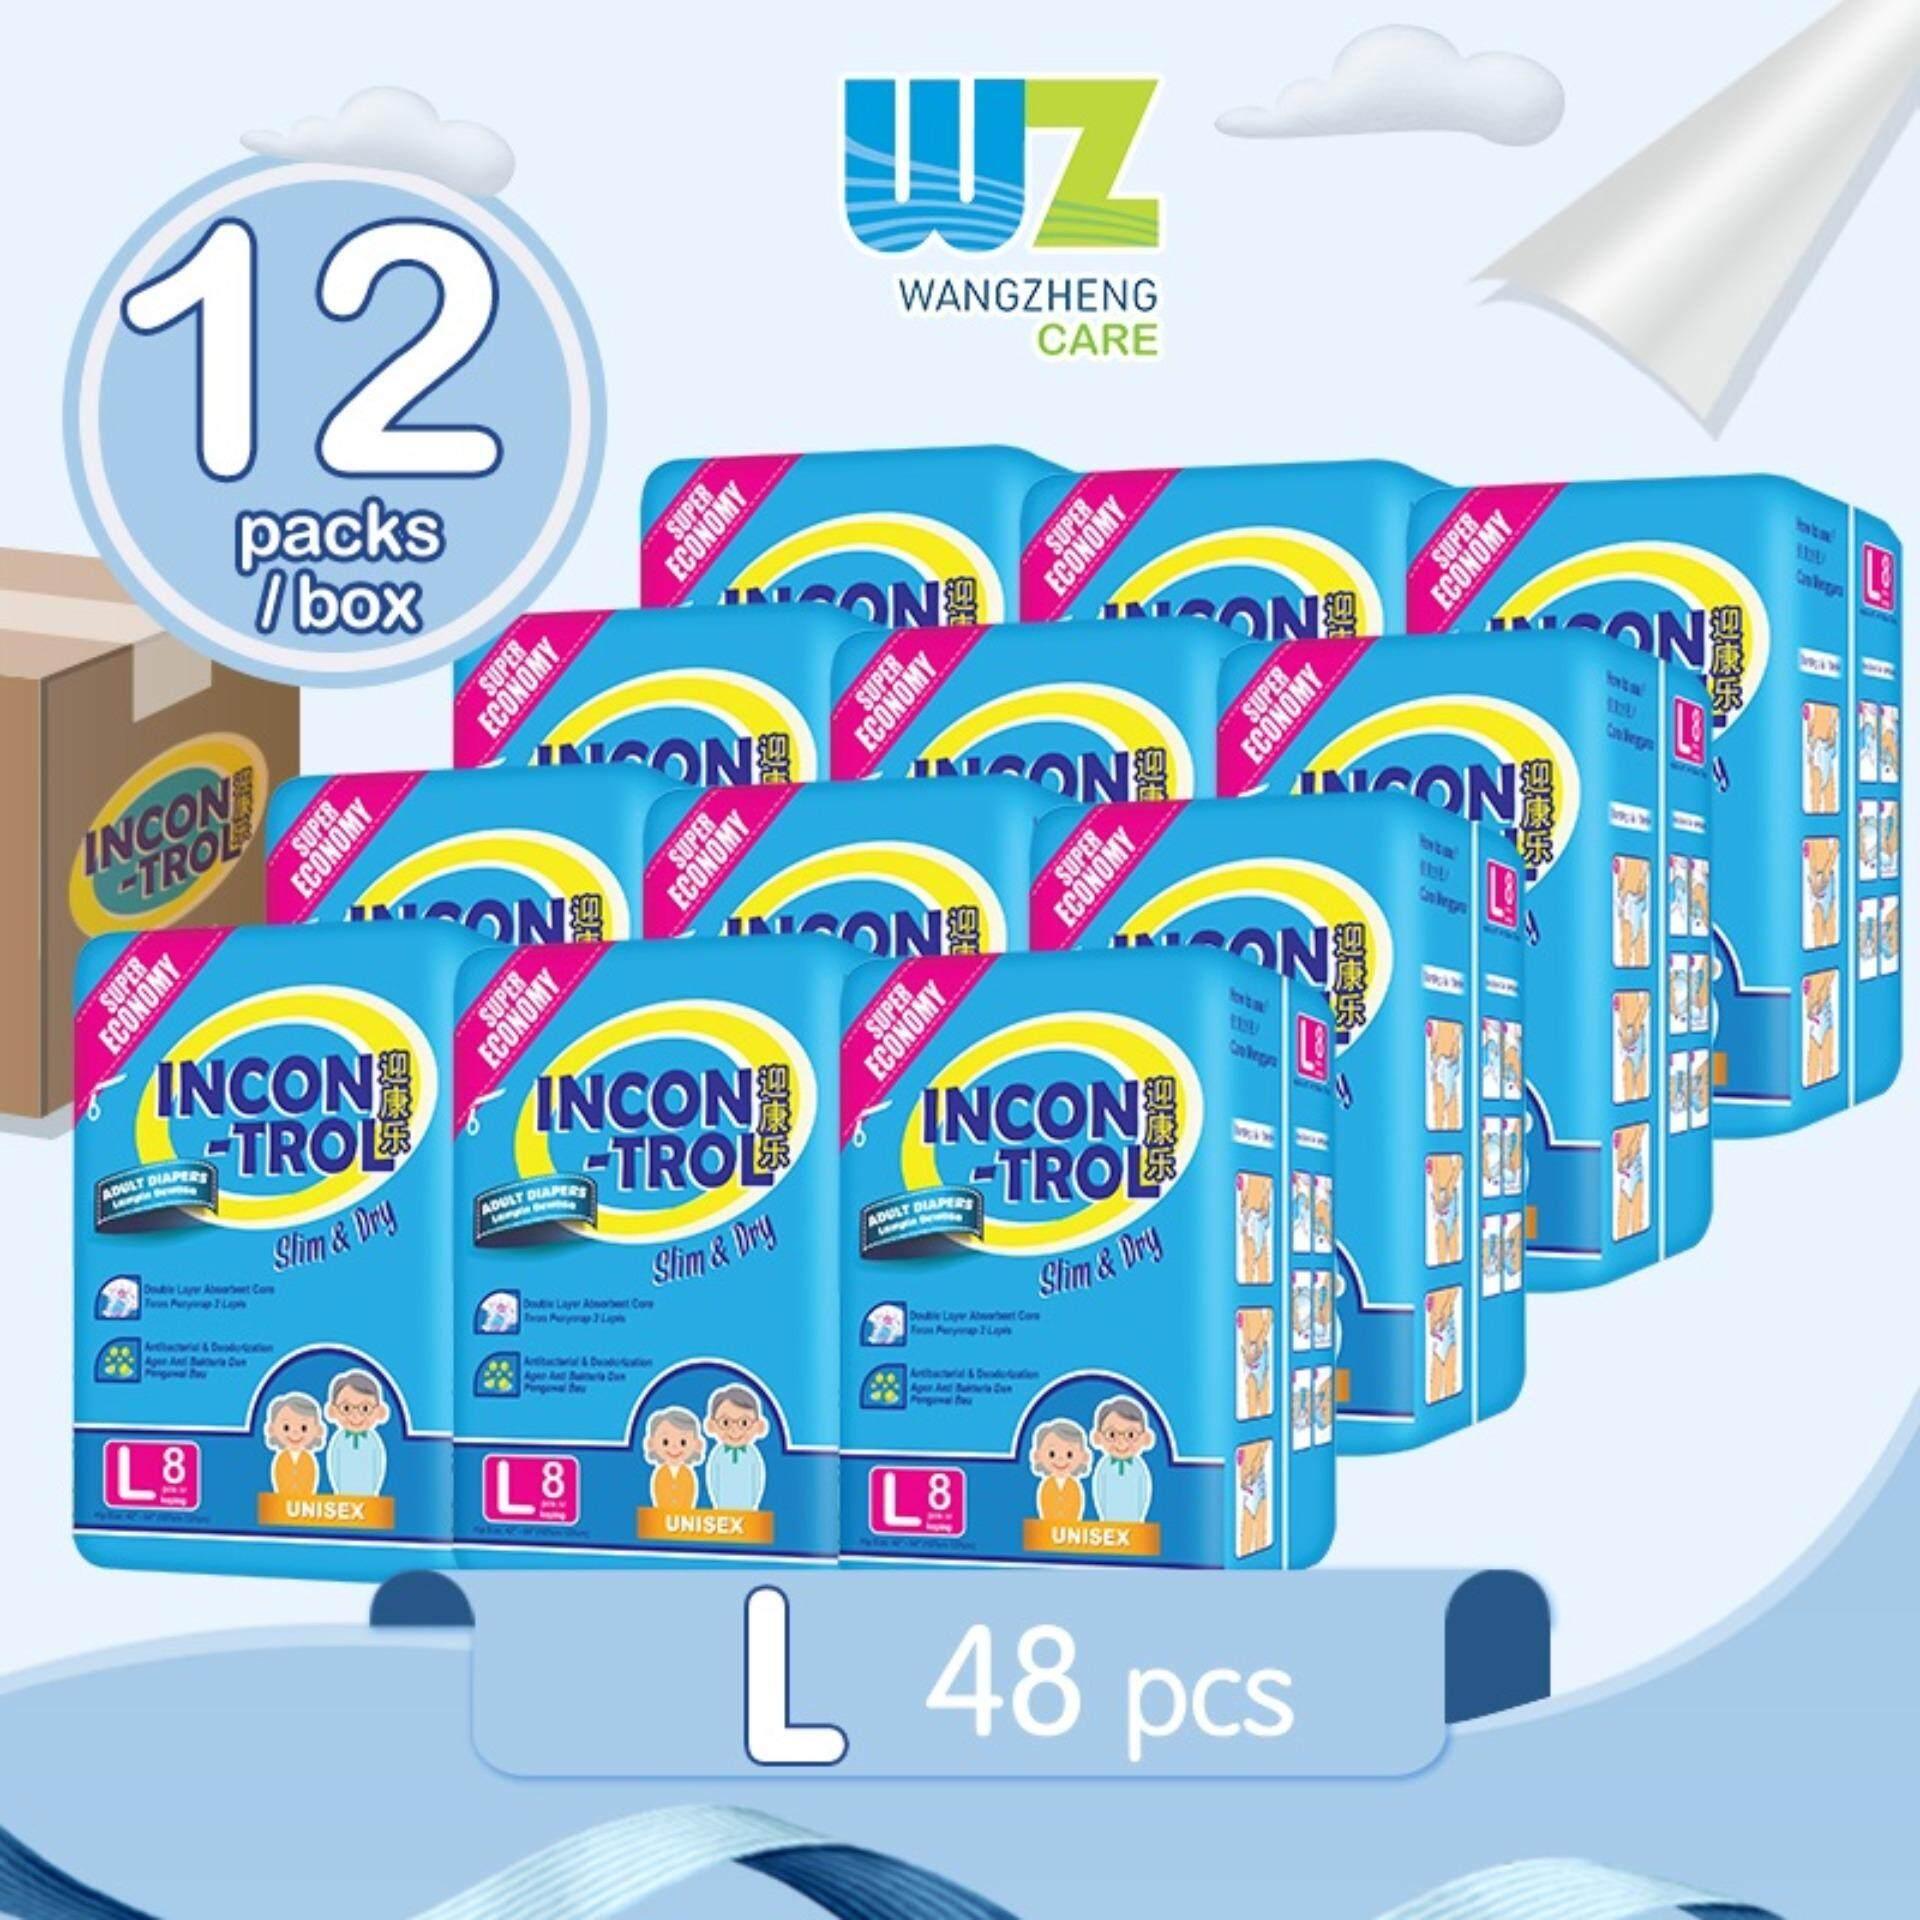 (Buatan Malaysia) Incontrol Adult Tape Diapers L8 x 12 Packs [WangZheng CARE]